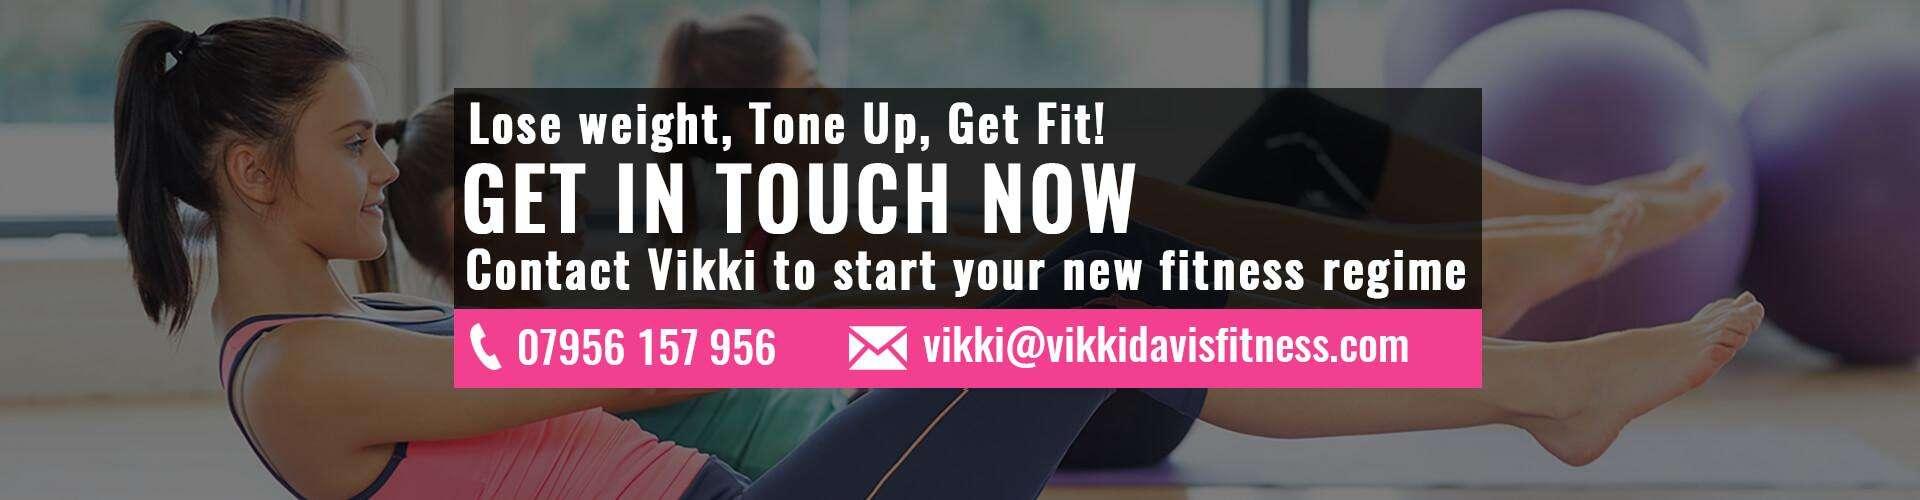 Online fitness pilates cardio hiit cardio boxing vikki d